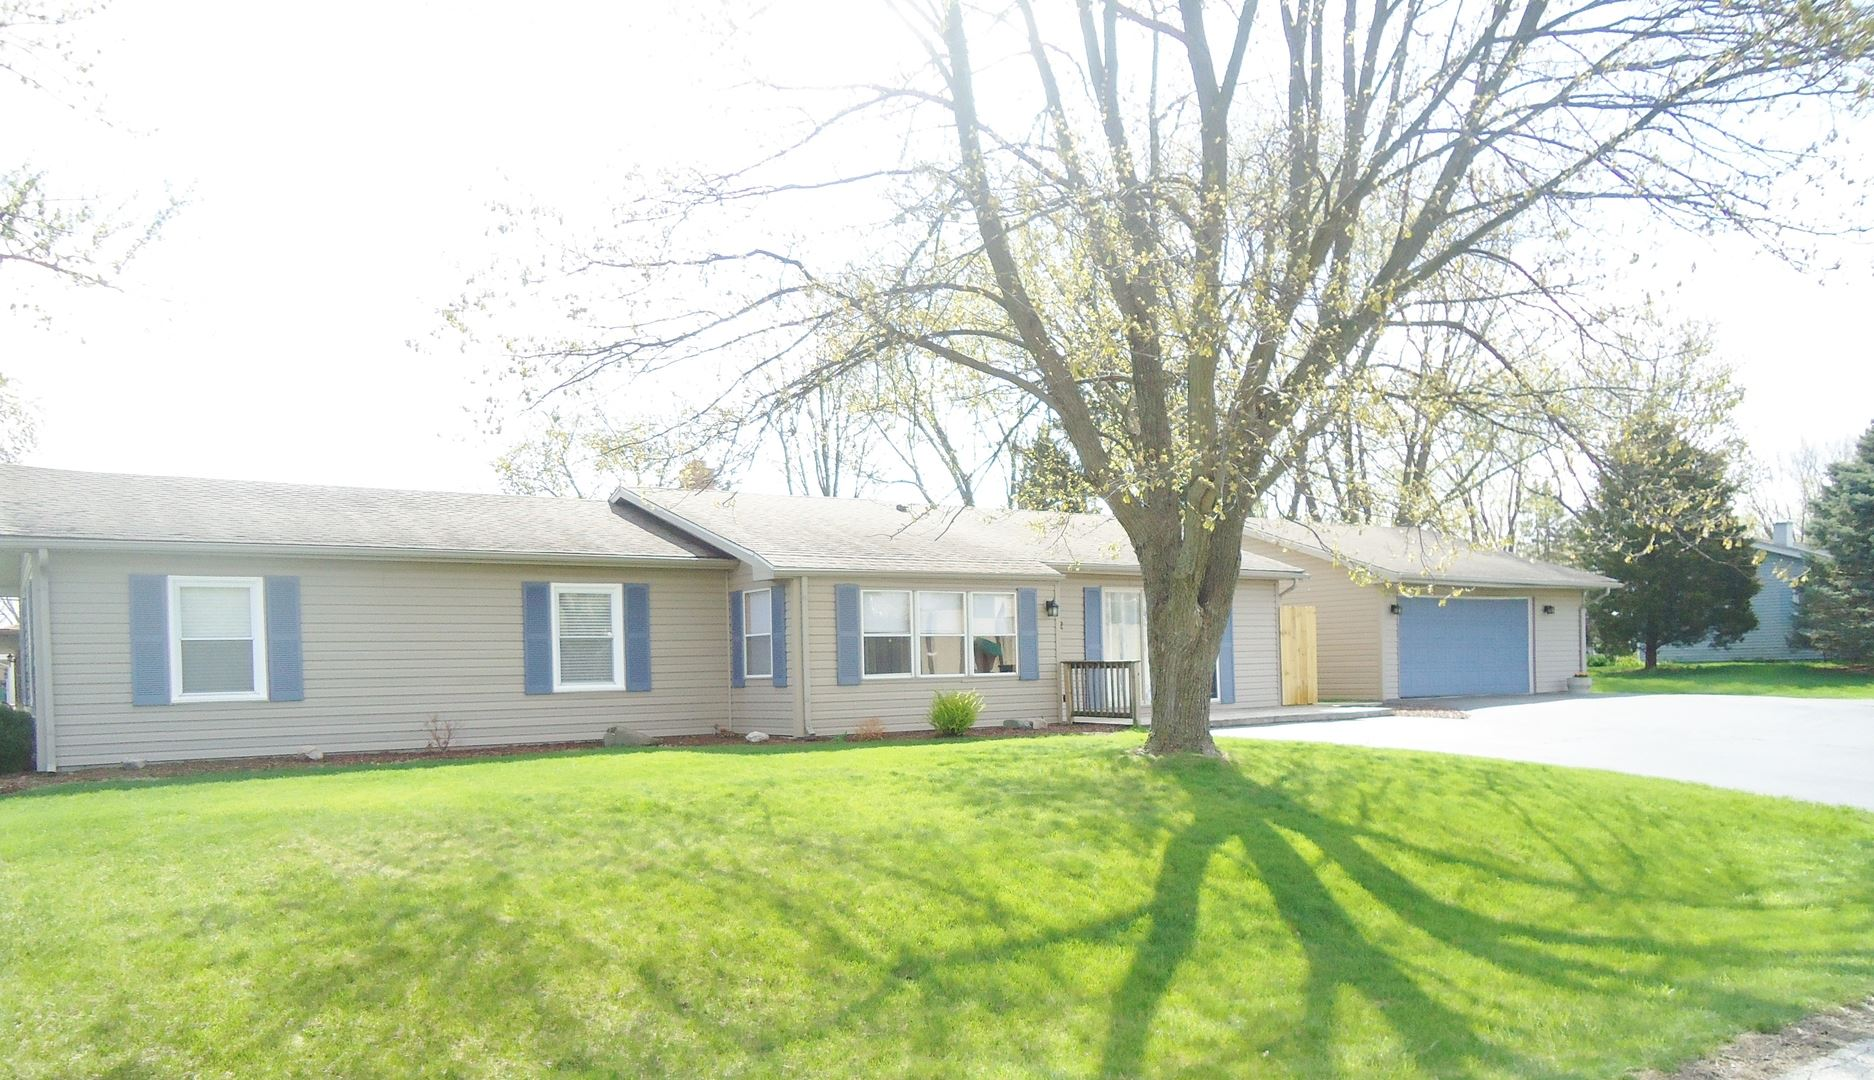 Photo of 712 Helene Street, Shorewood, IL 60404 (MLS # 11050741)